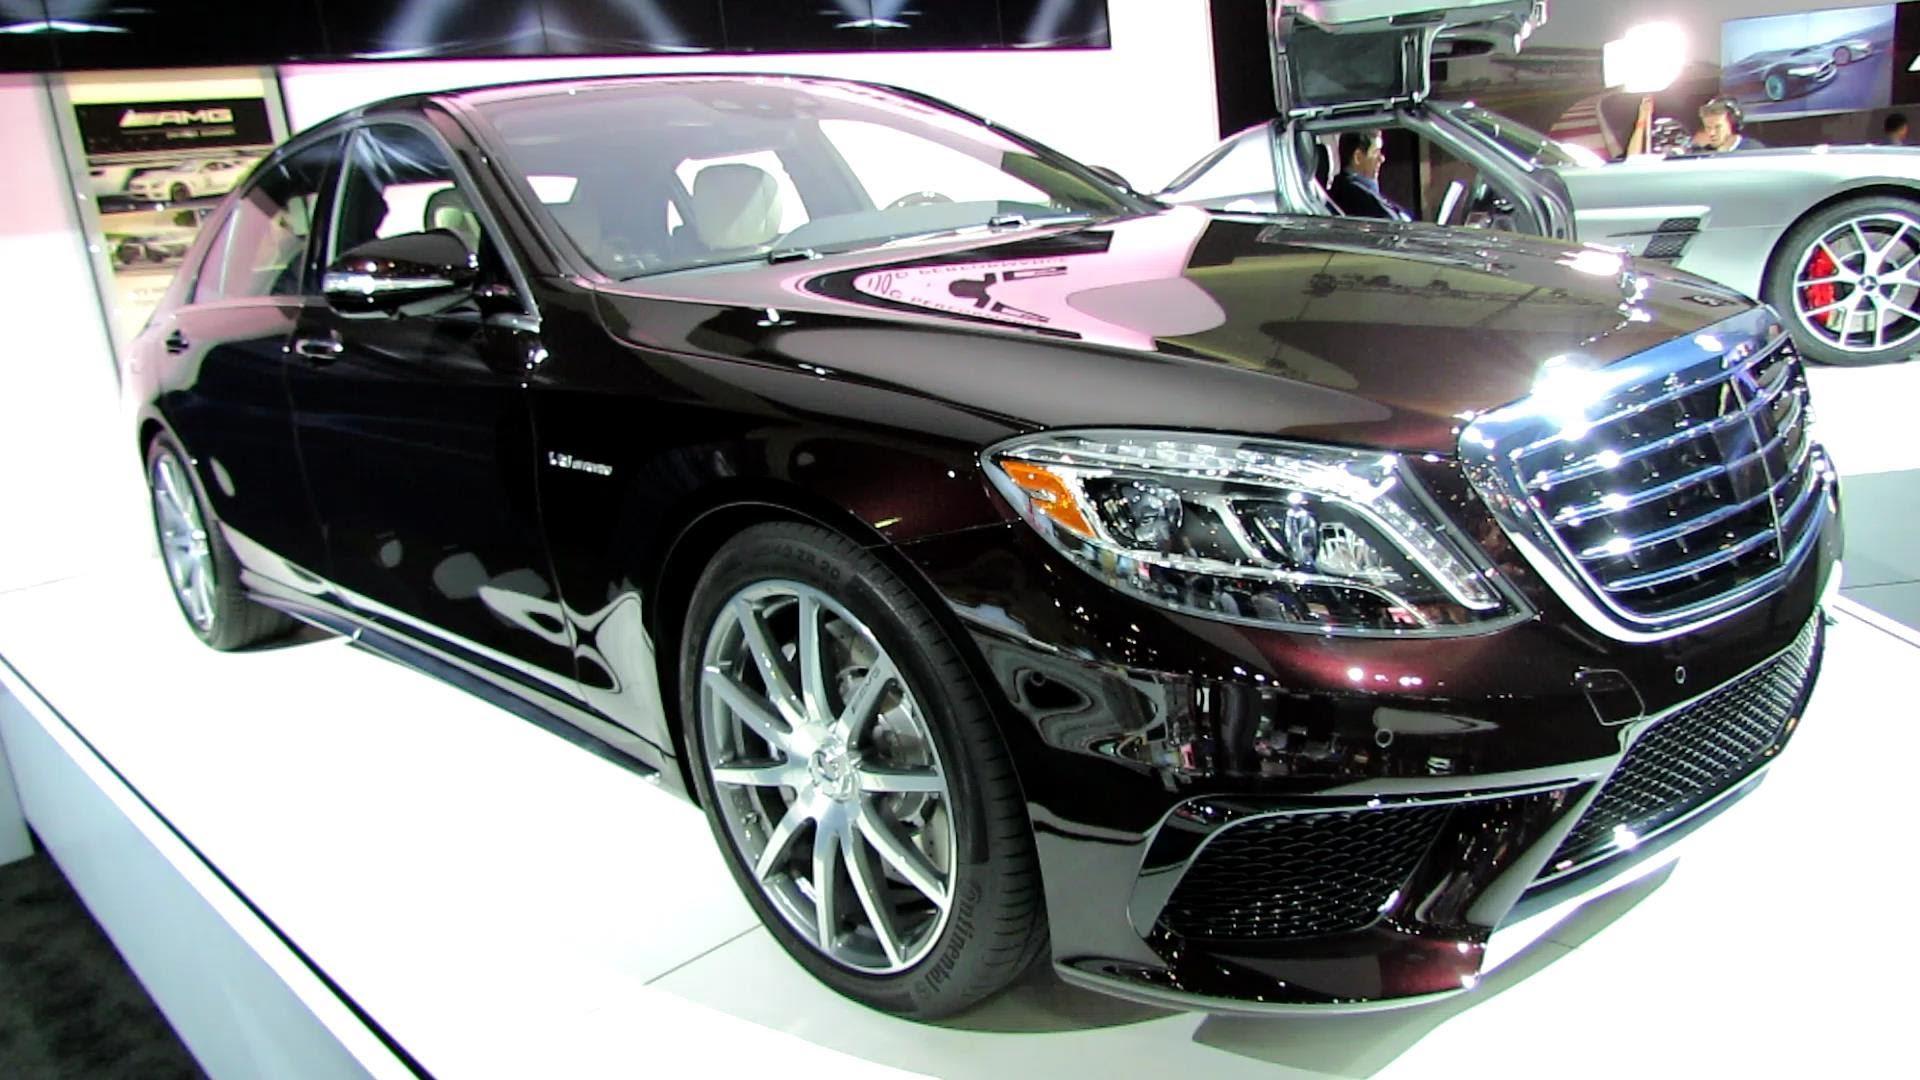 Mercedes-Benz S-klasse VI (W222, C217) 2013 - now Sedan #2